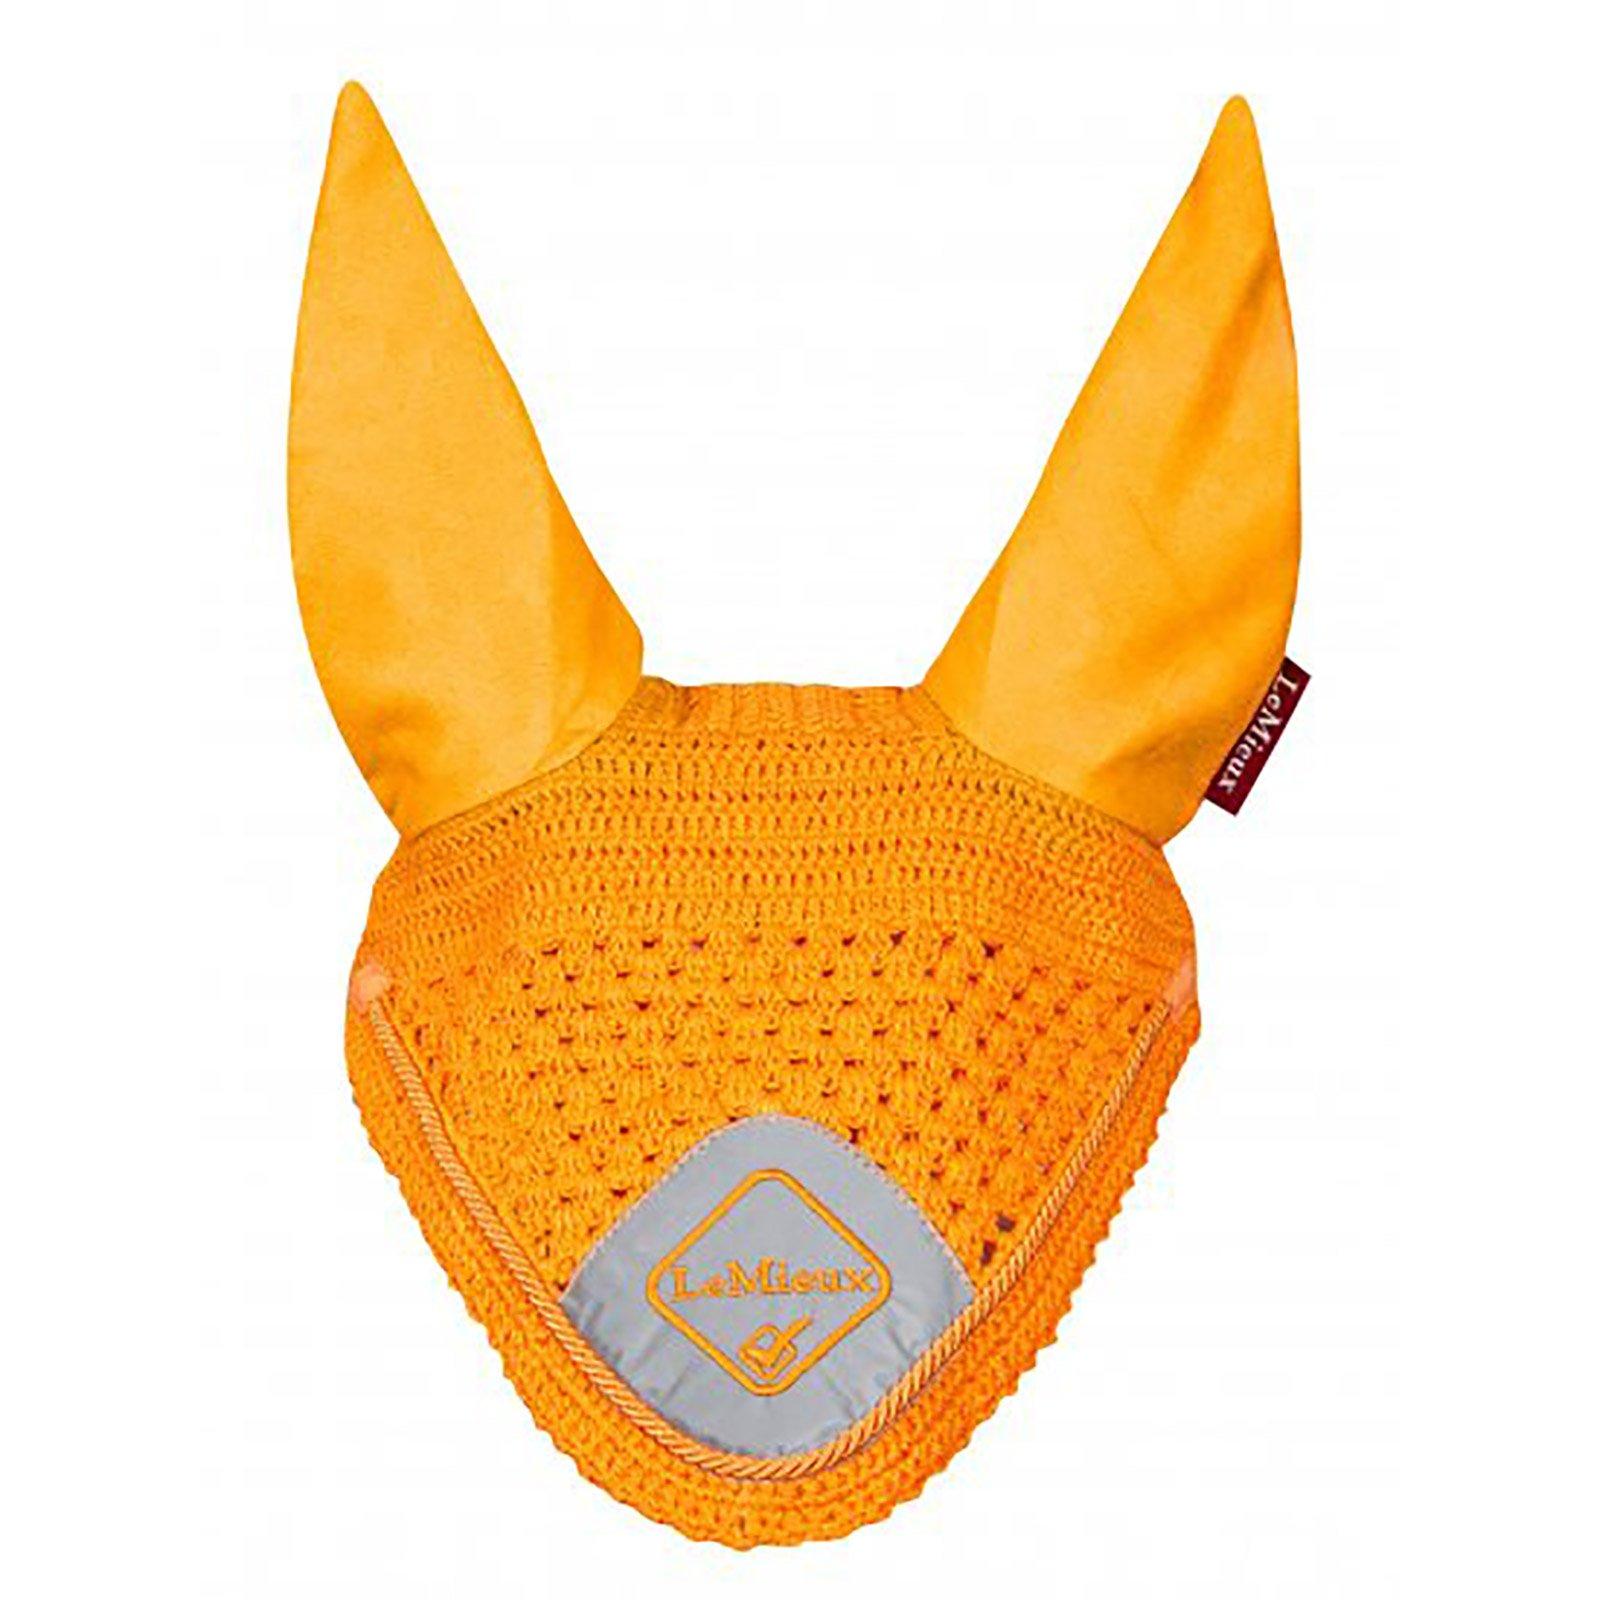 Lemieux High Visibility Fly Hood - Tangerine - Large